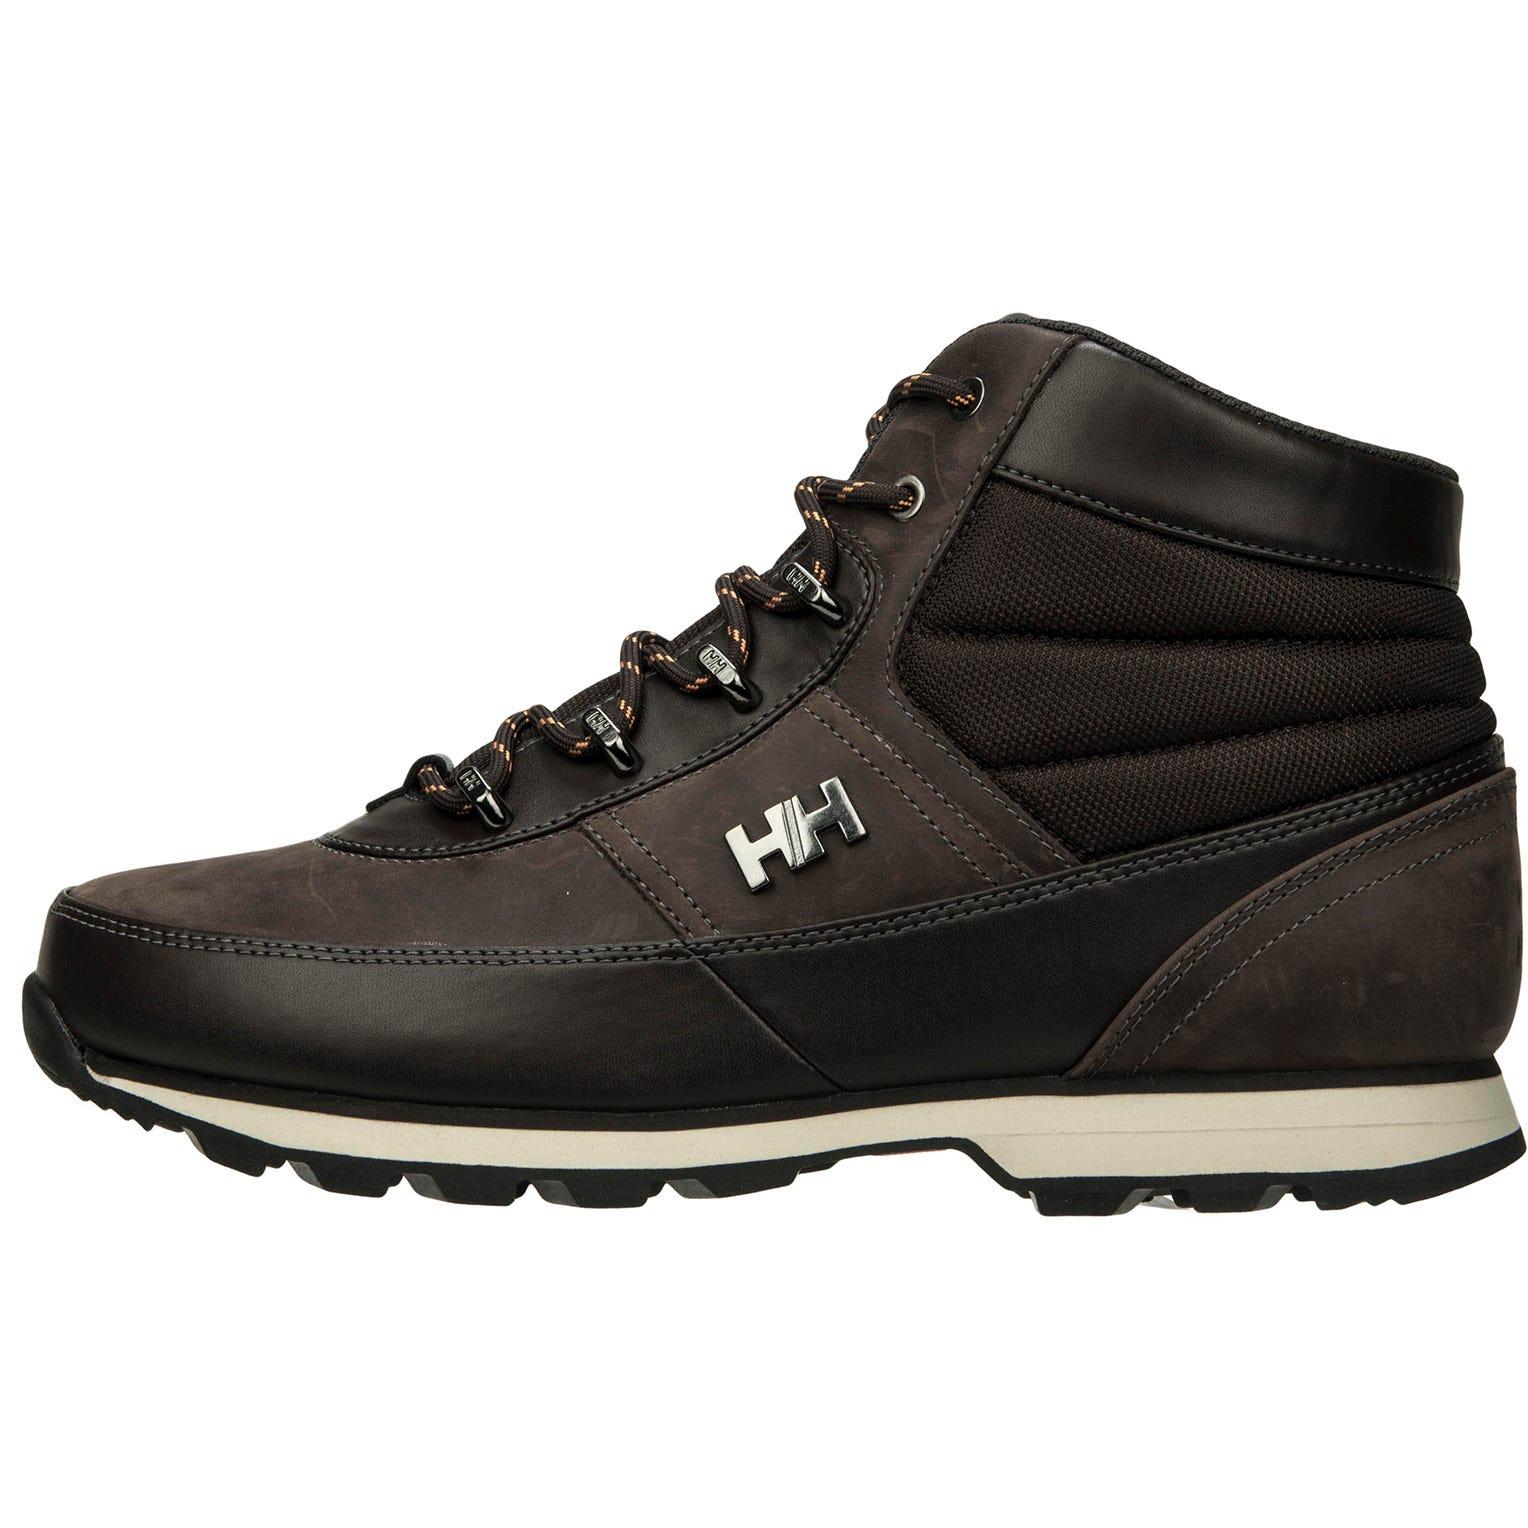 Helly Hansen Woodlands Mens Winter Boot Brown 44.5/10.5